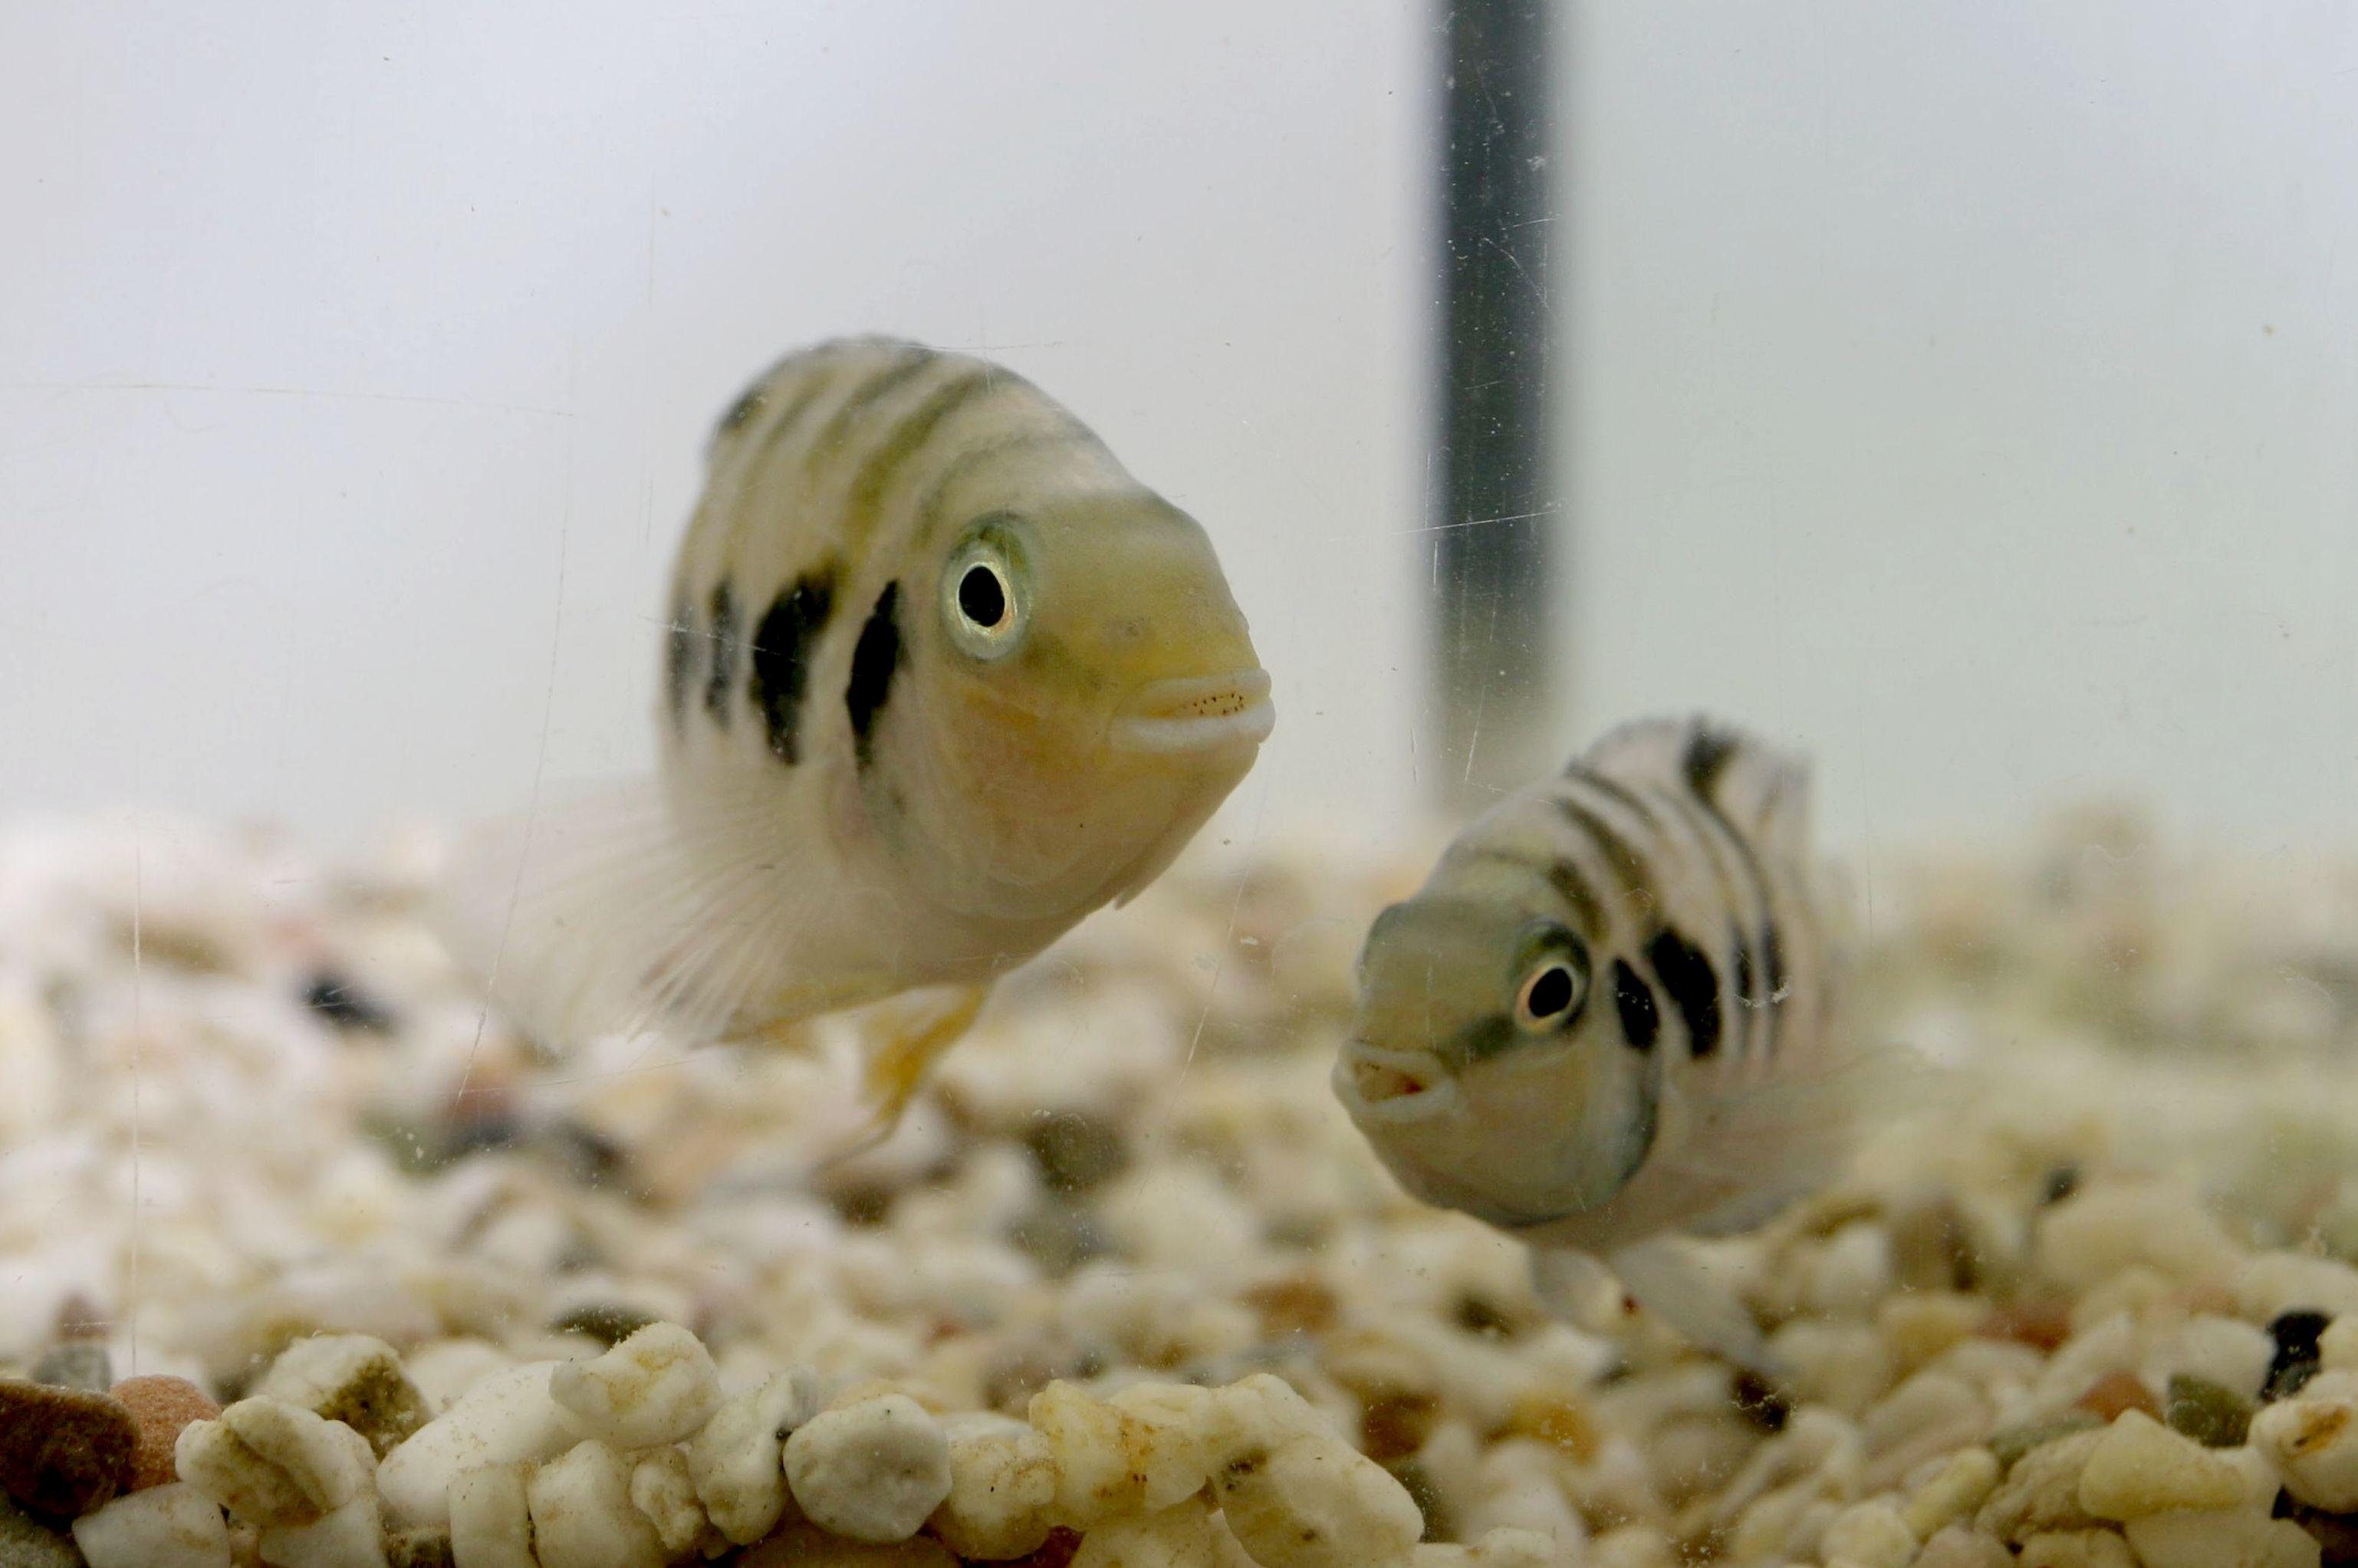 a pair in the lab 02 - chloe laubu 20156